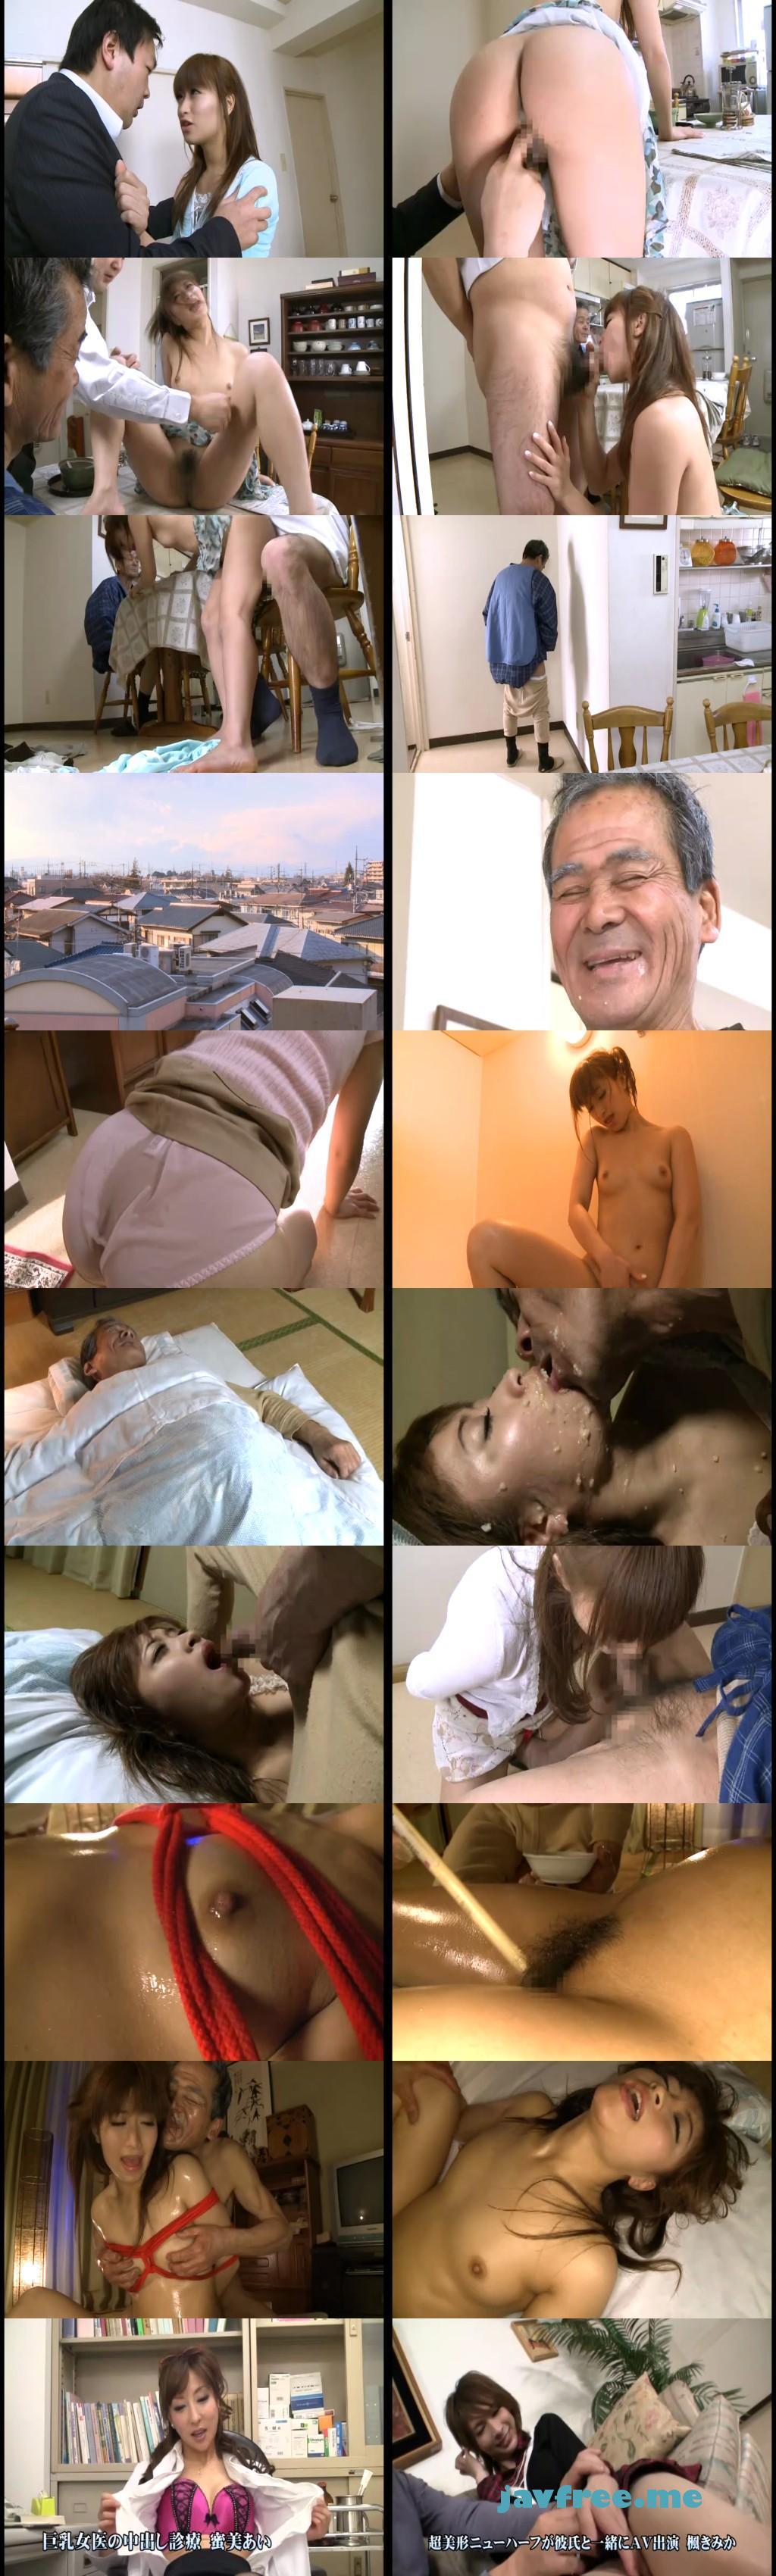 [HNB 065] 義父の嫁虐り 加瀬あゆむ 加瀬あゆむ HNB